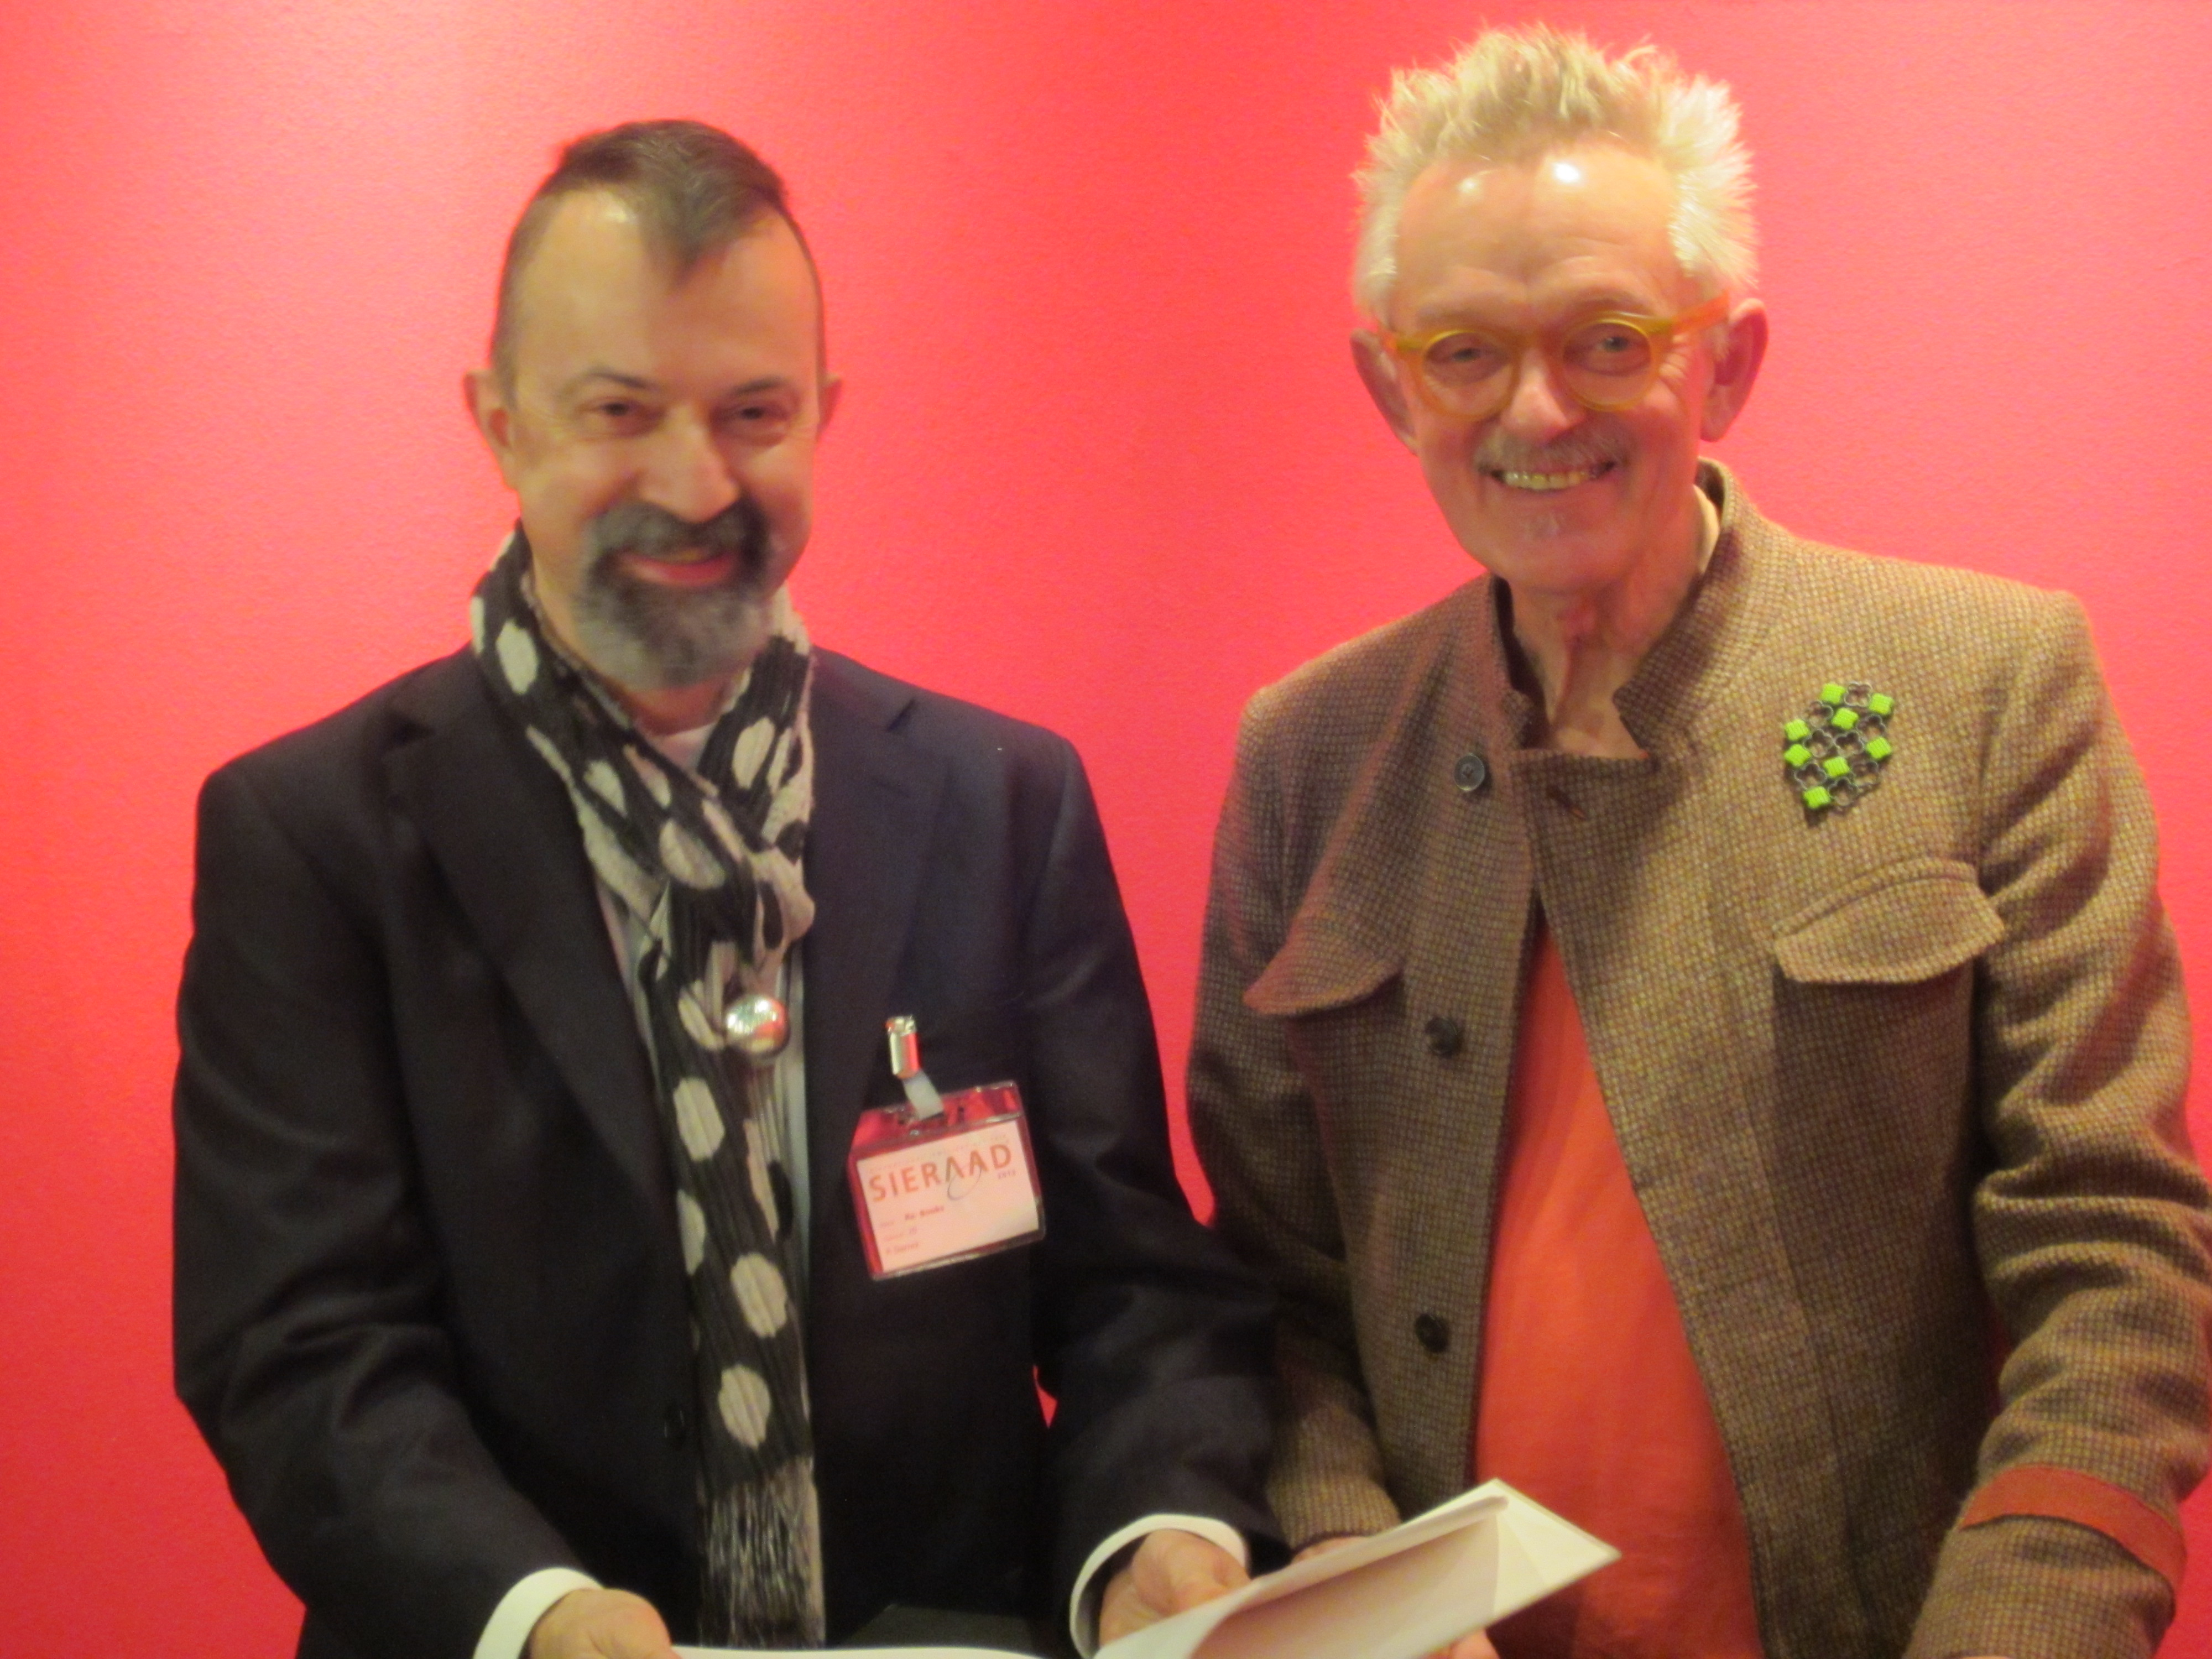 Paul Derrez en Willem Hoogstede op Ra Books, Sieraad Art Fair, 2012, portret, Gashouder, Westergasfabriek, Amsterdam